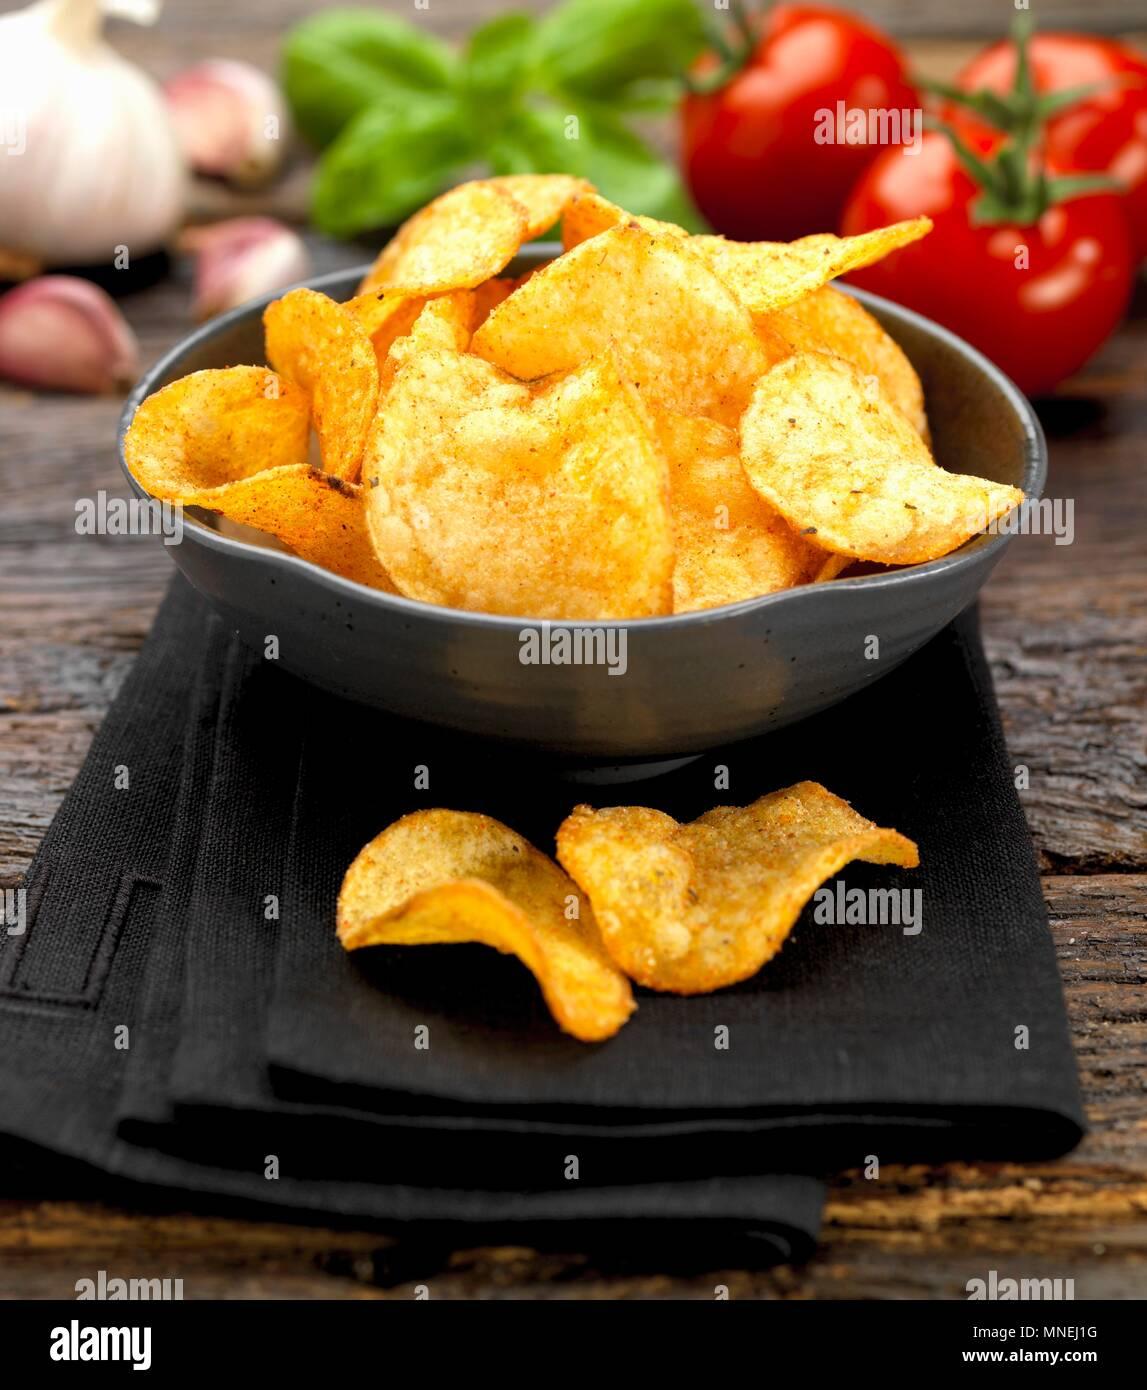 A bowl of tomato crisps - Stock Image